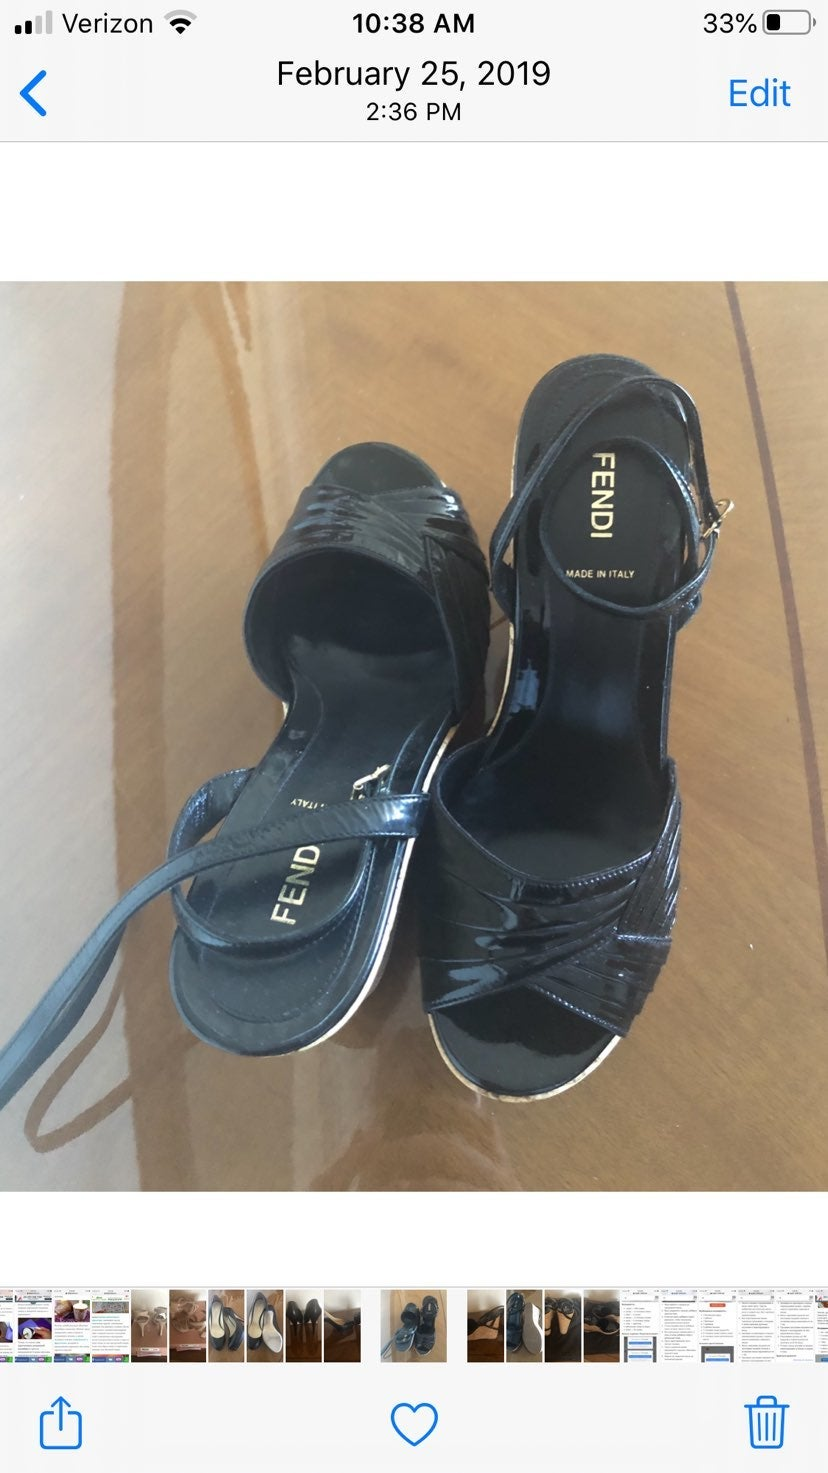 BRAND NEW Fendi Black Platform Heels